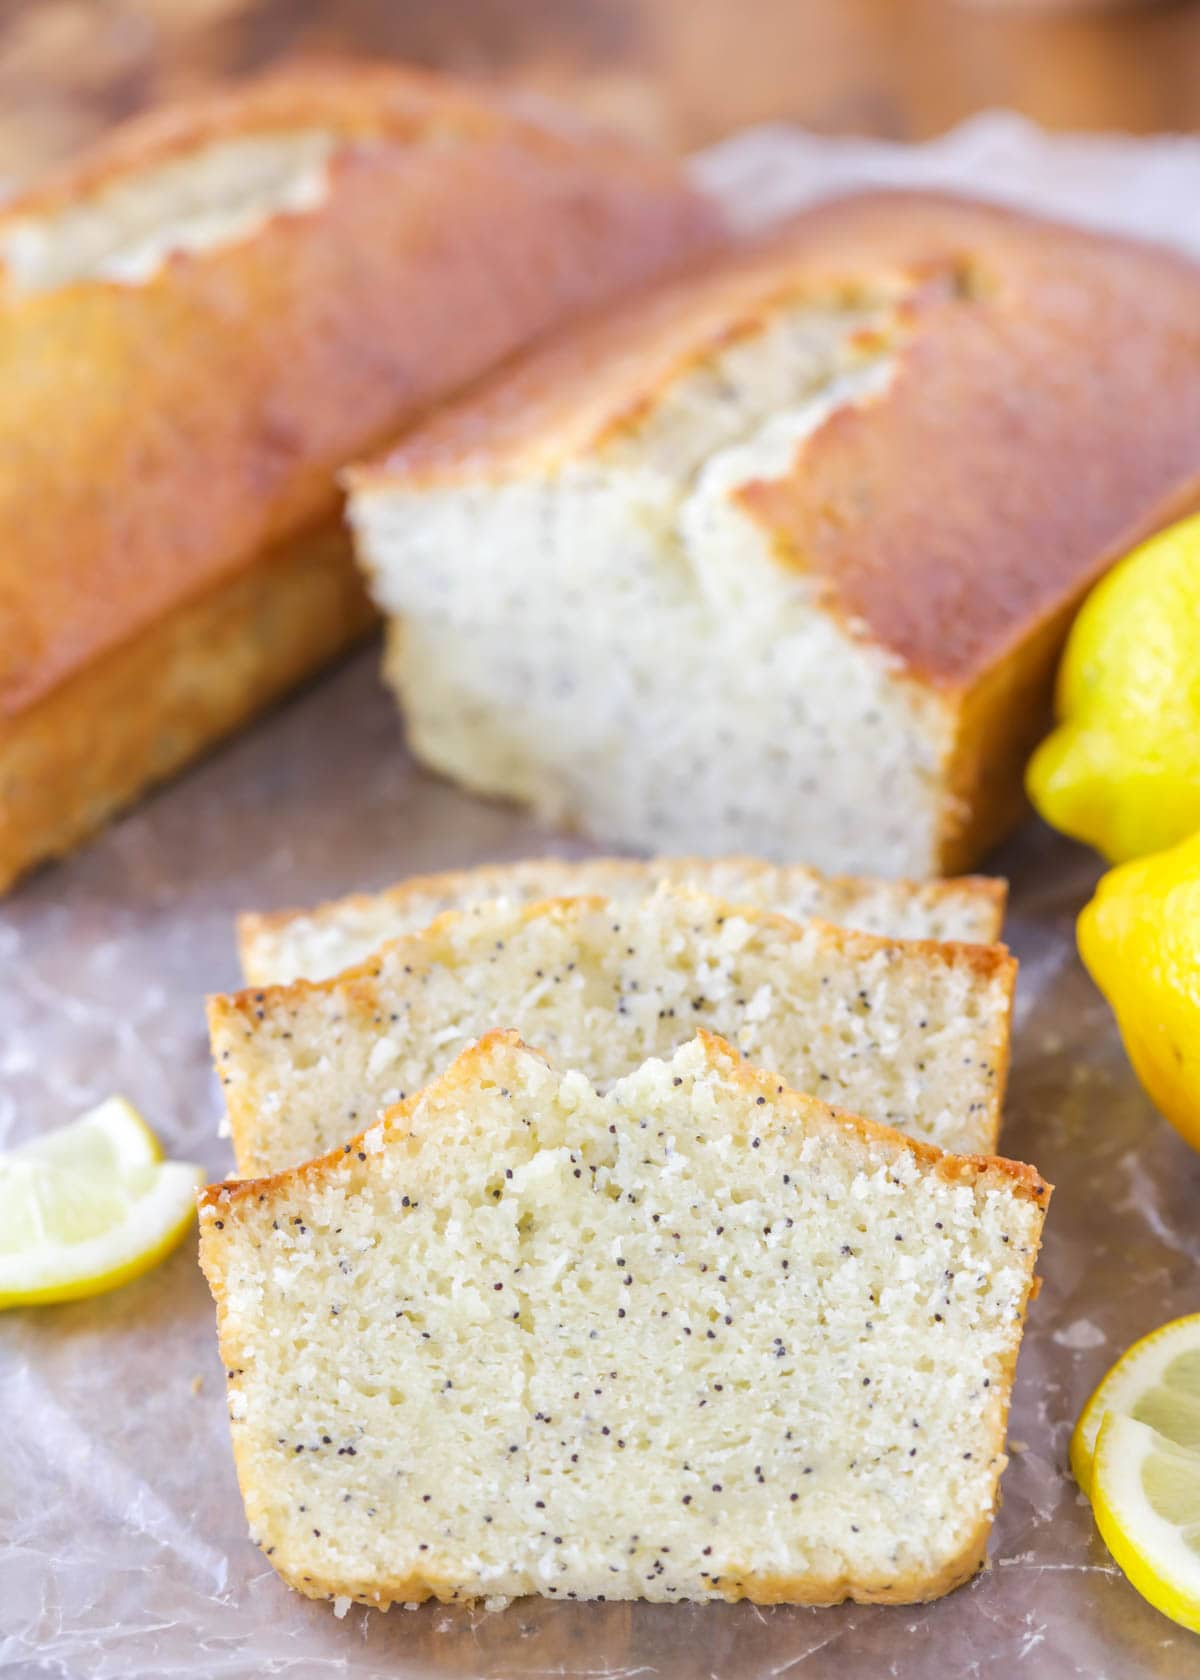 Lemon Poppy Seed Bread recipe on parchment paper